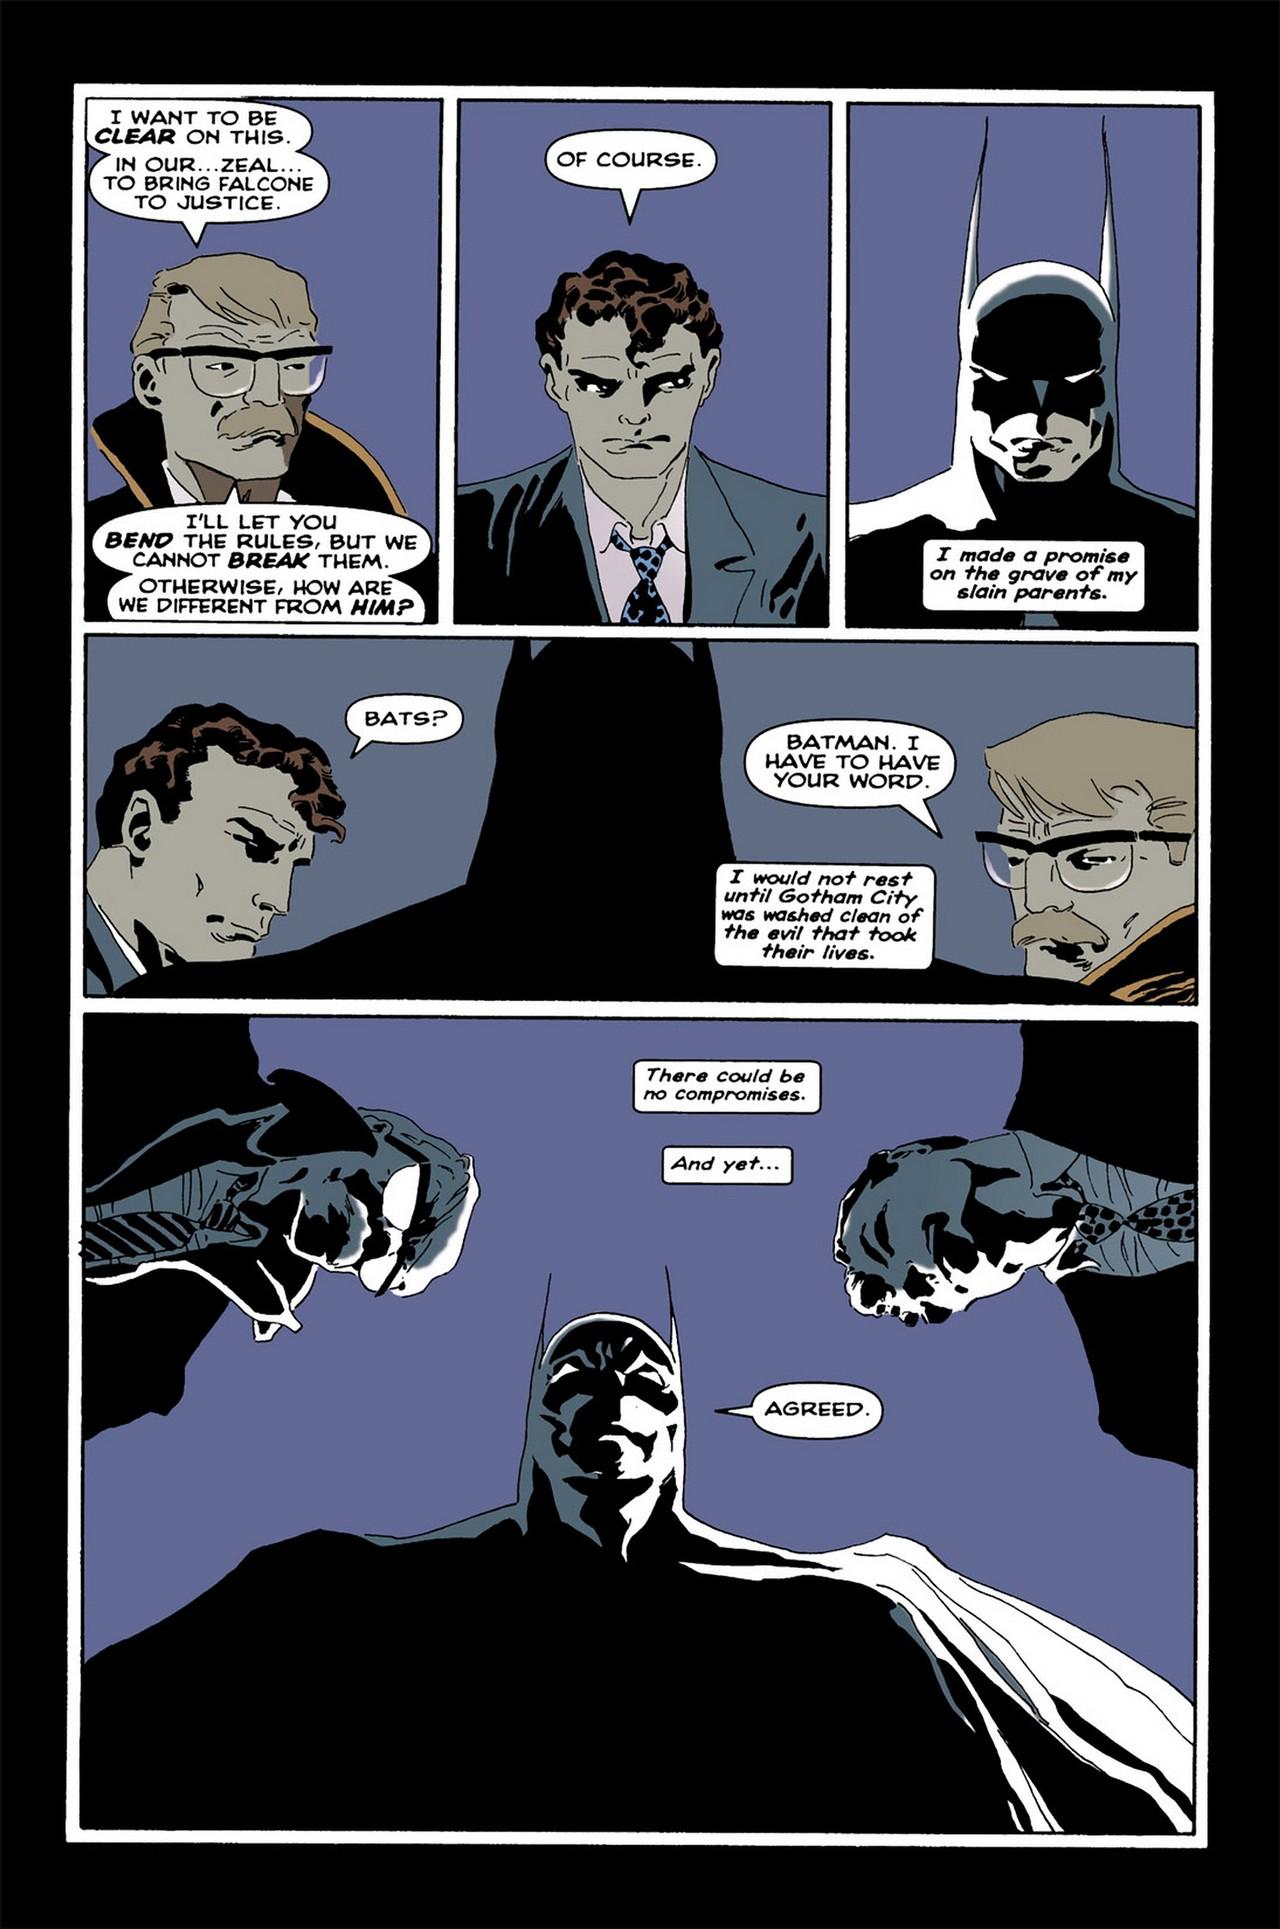 Psychology of Bruce Wayne RCO027